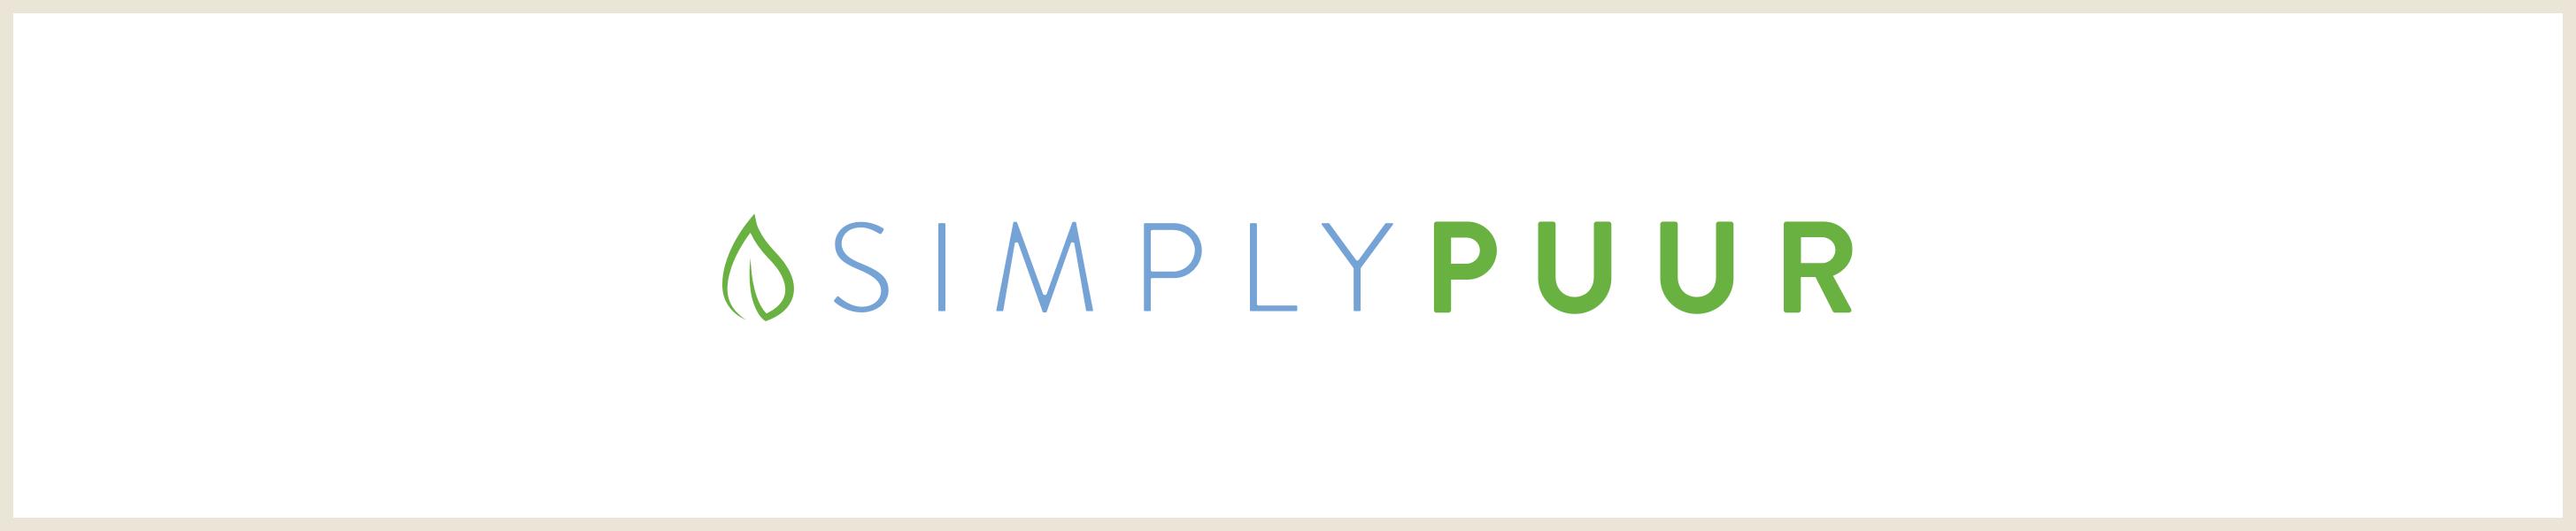 simply-puur@3x